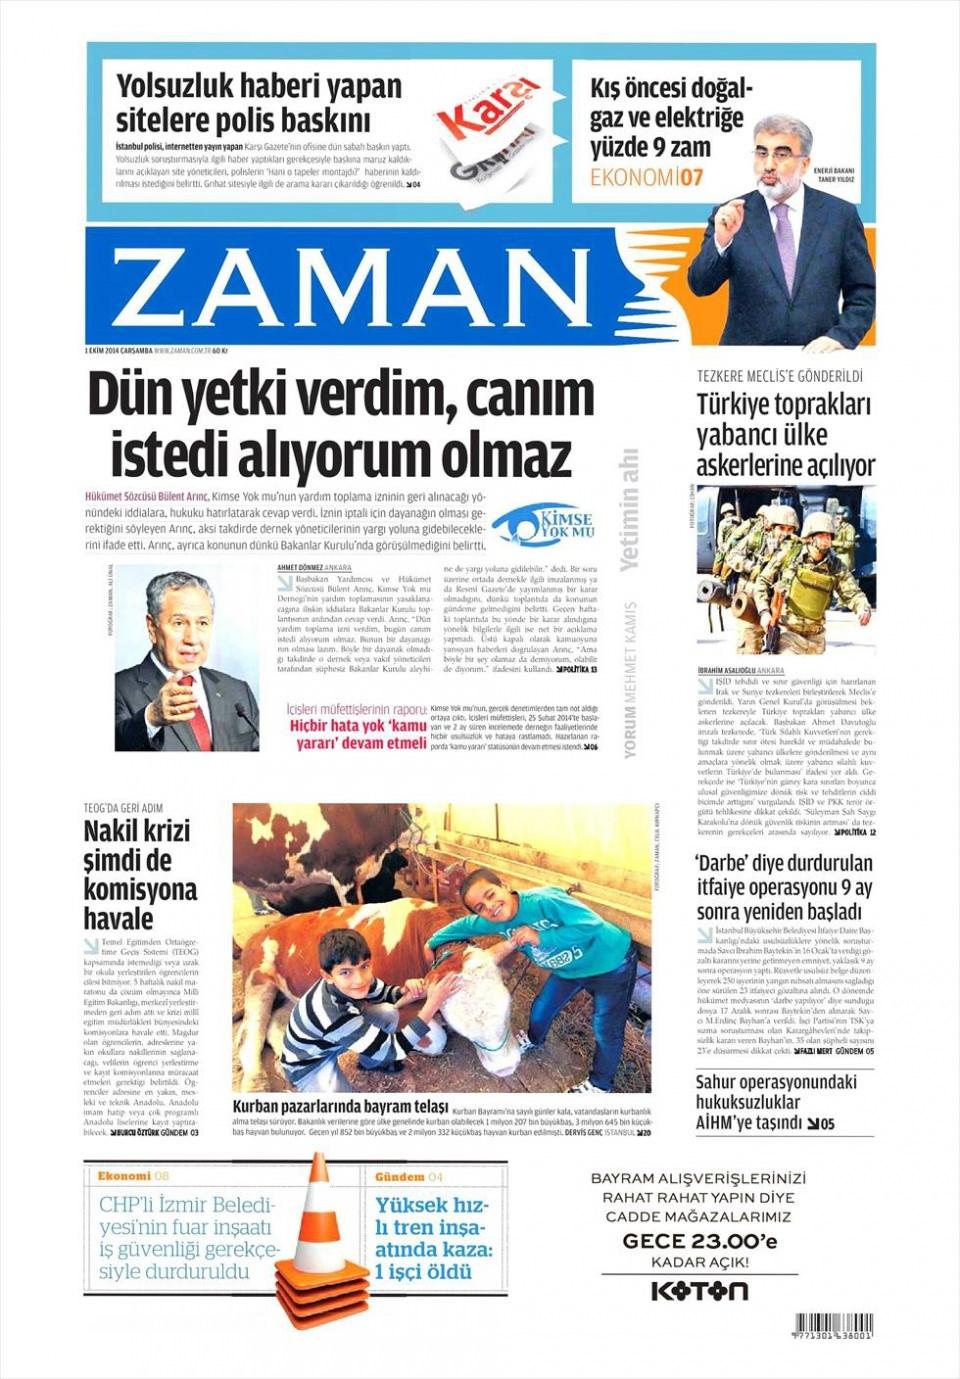 1 Ekim 2014 gazete manşetleri 25